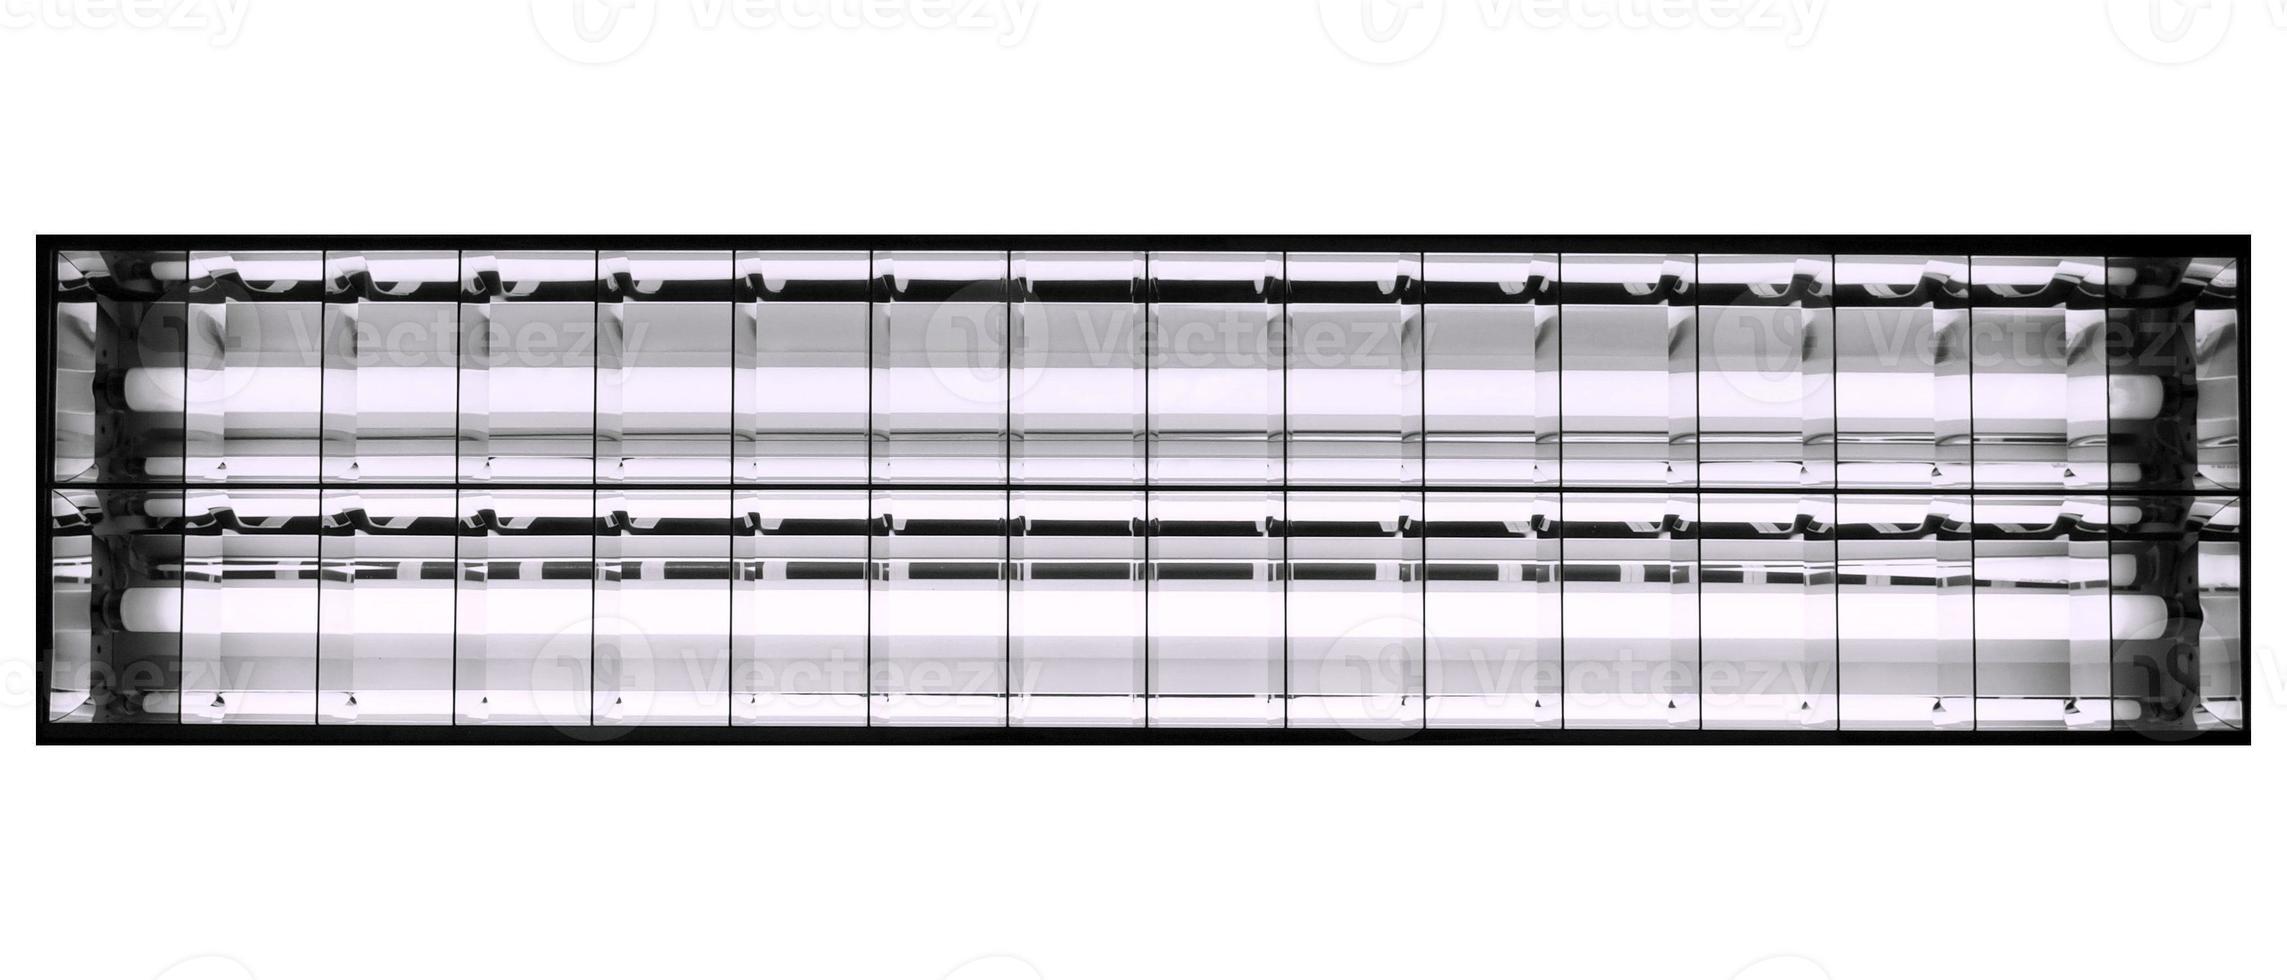 Lámpara de luz de neón aislada sobre blanco foto